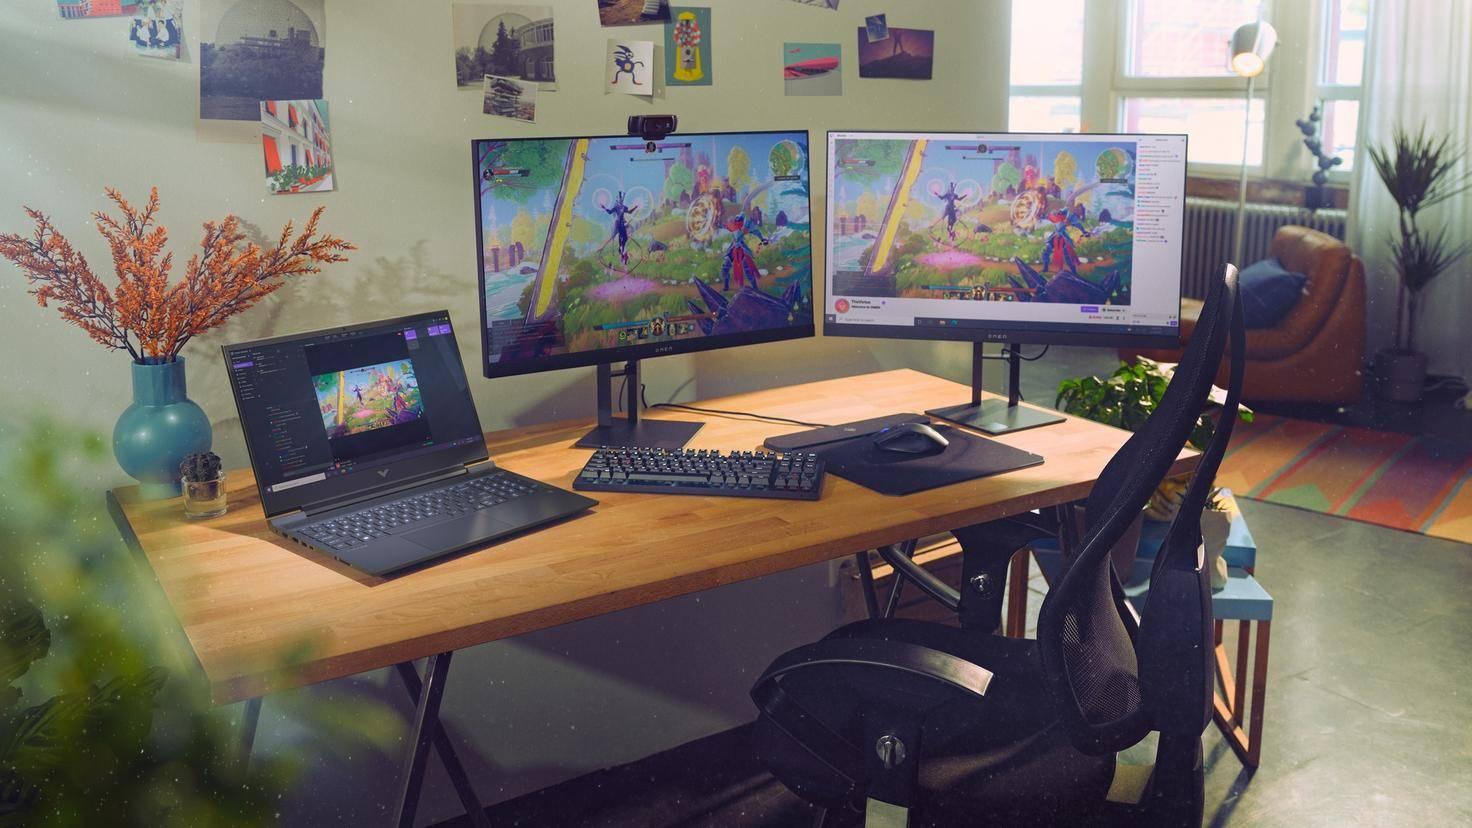 Victus-HP-16-2-gaming-laptop-notebook